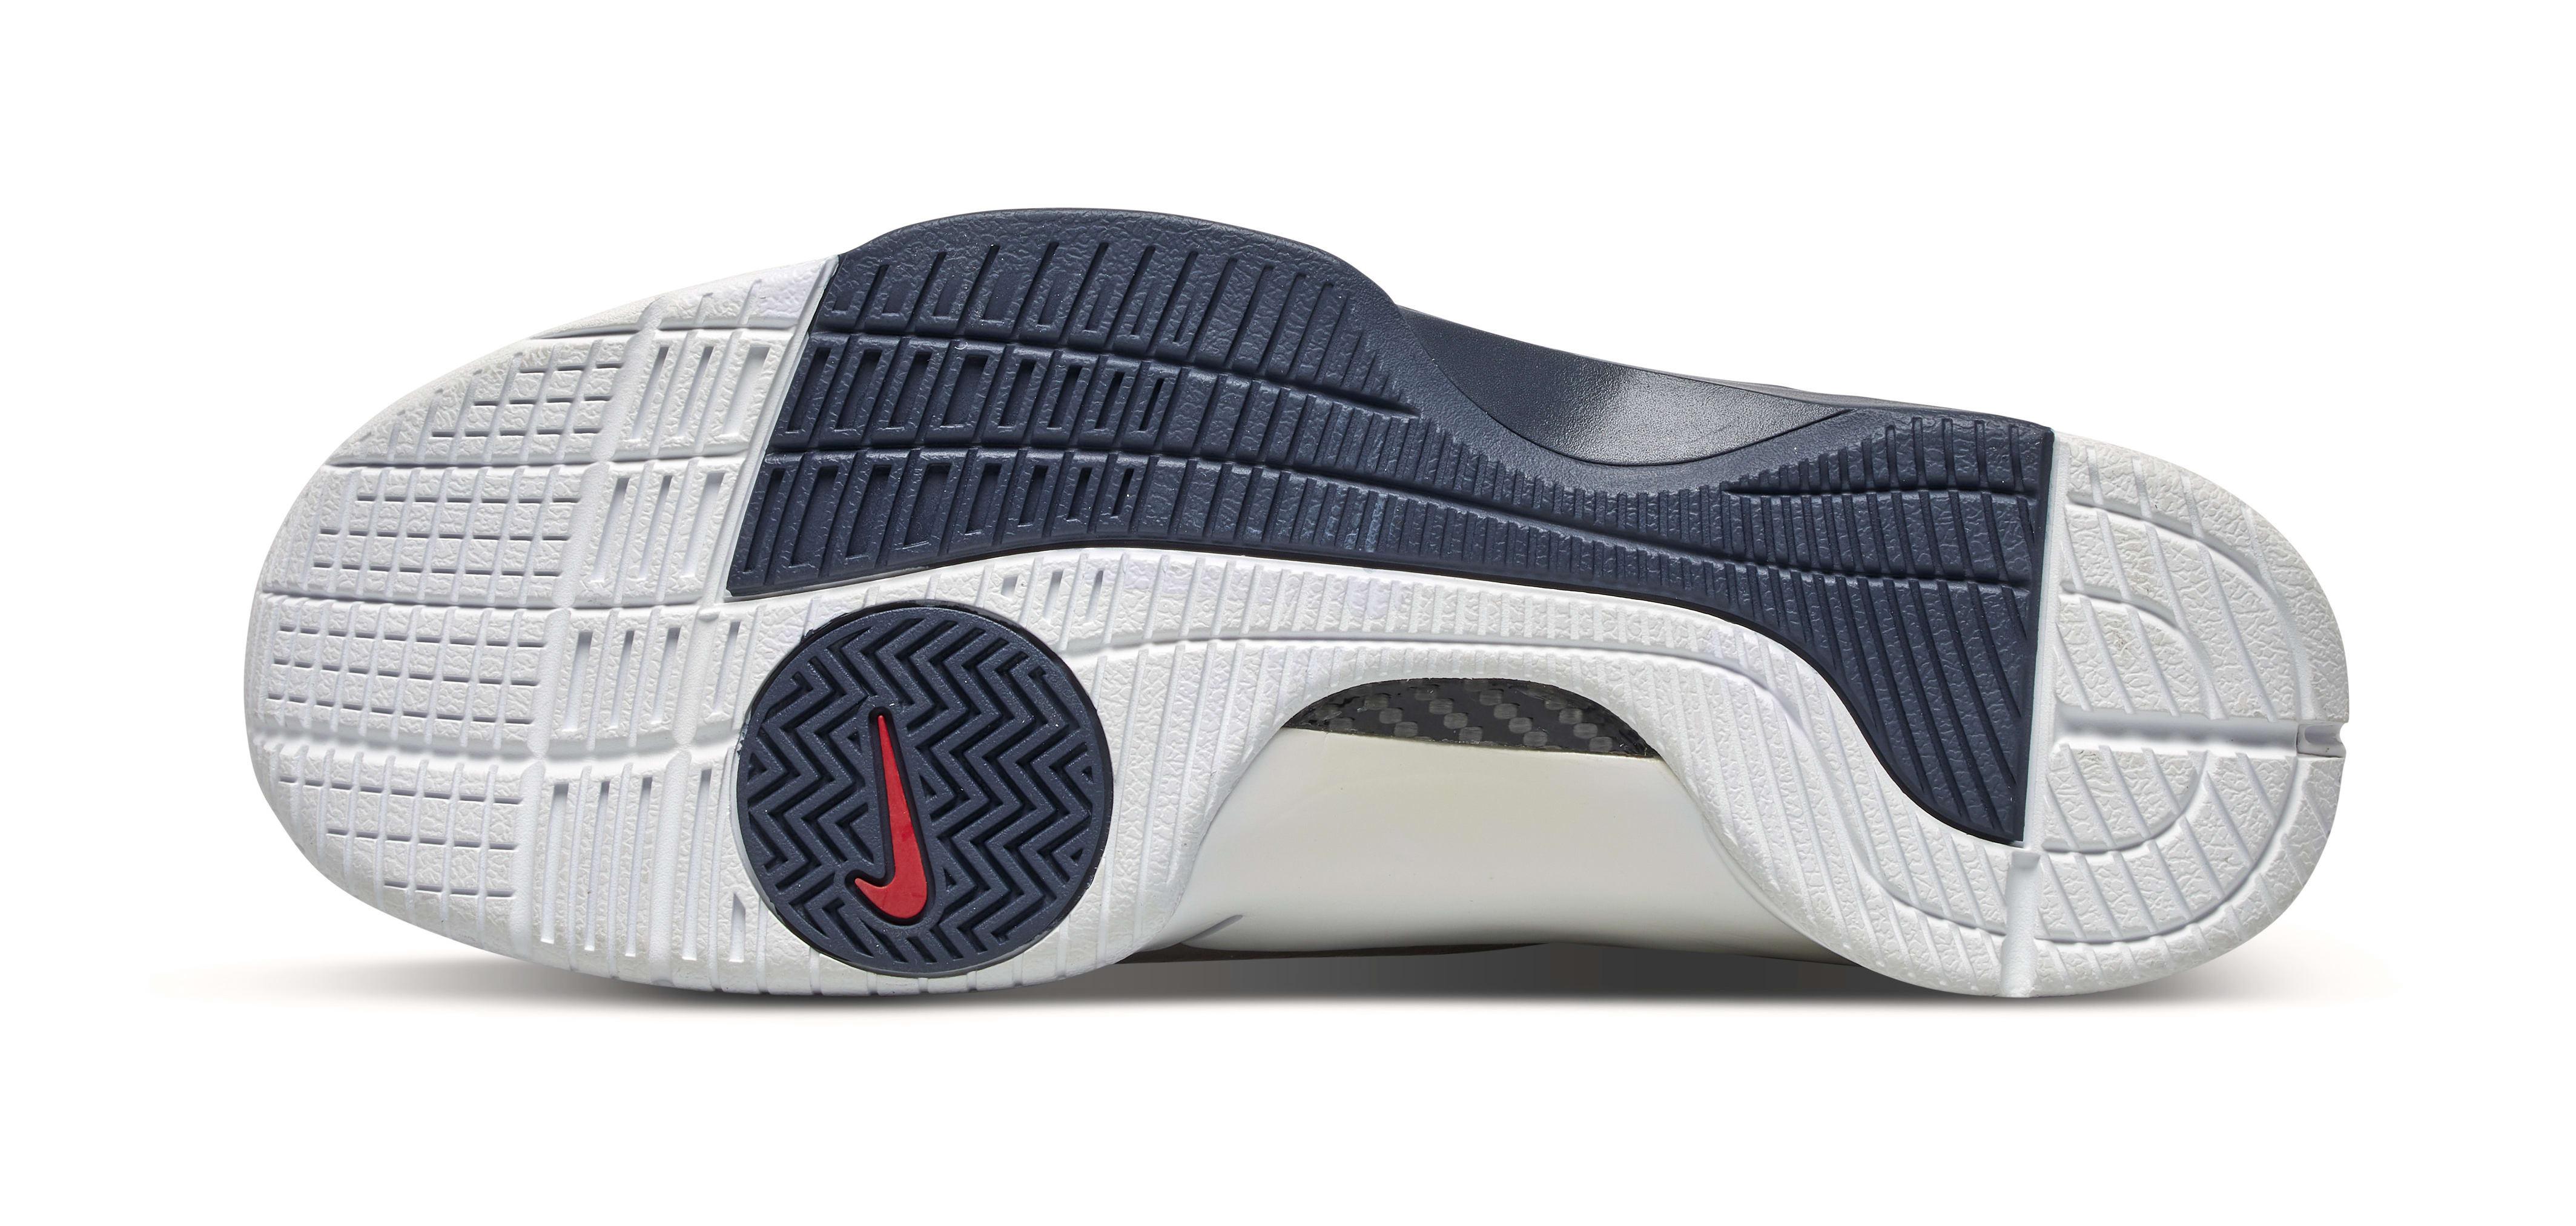 Nike Hyperdunk 'Barack Obama' PE Outsole